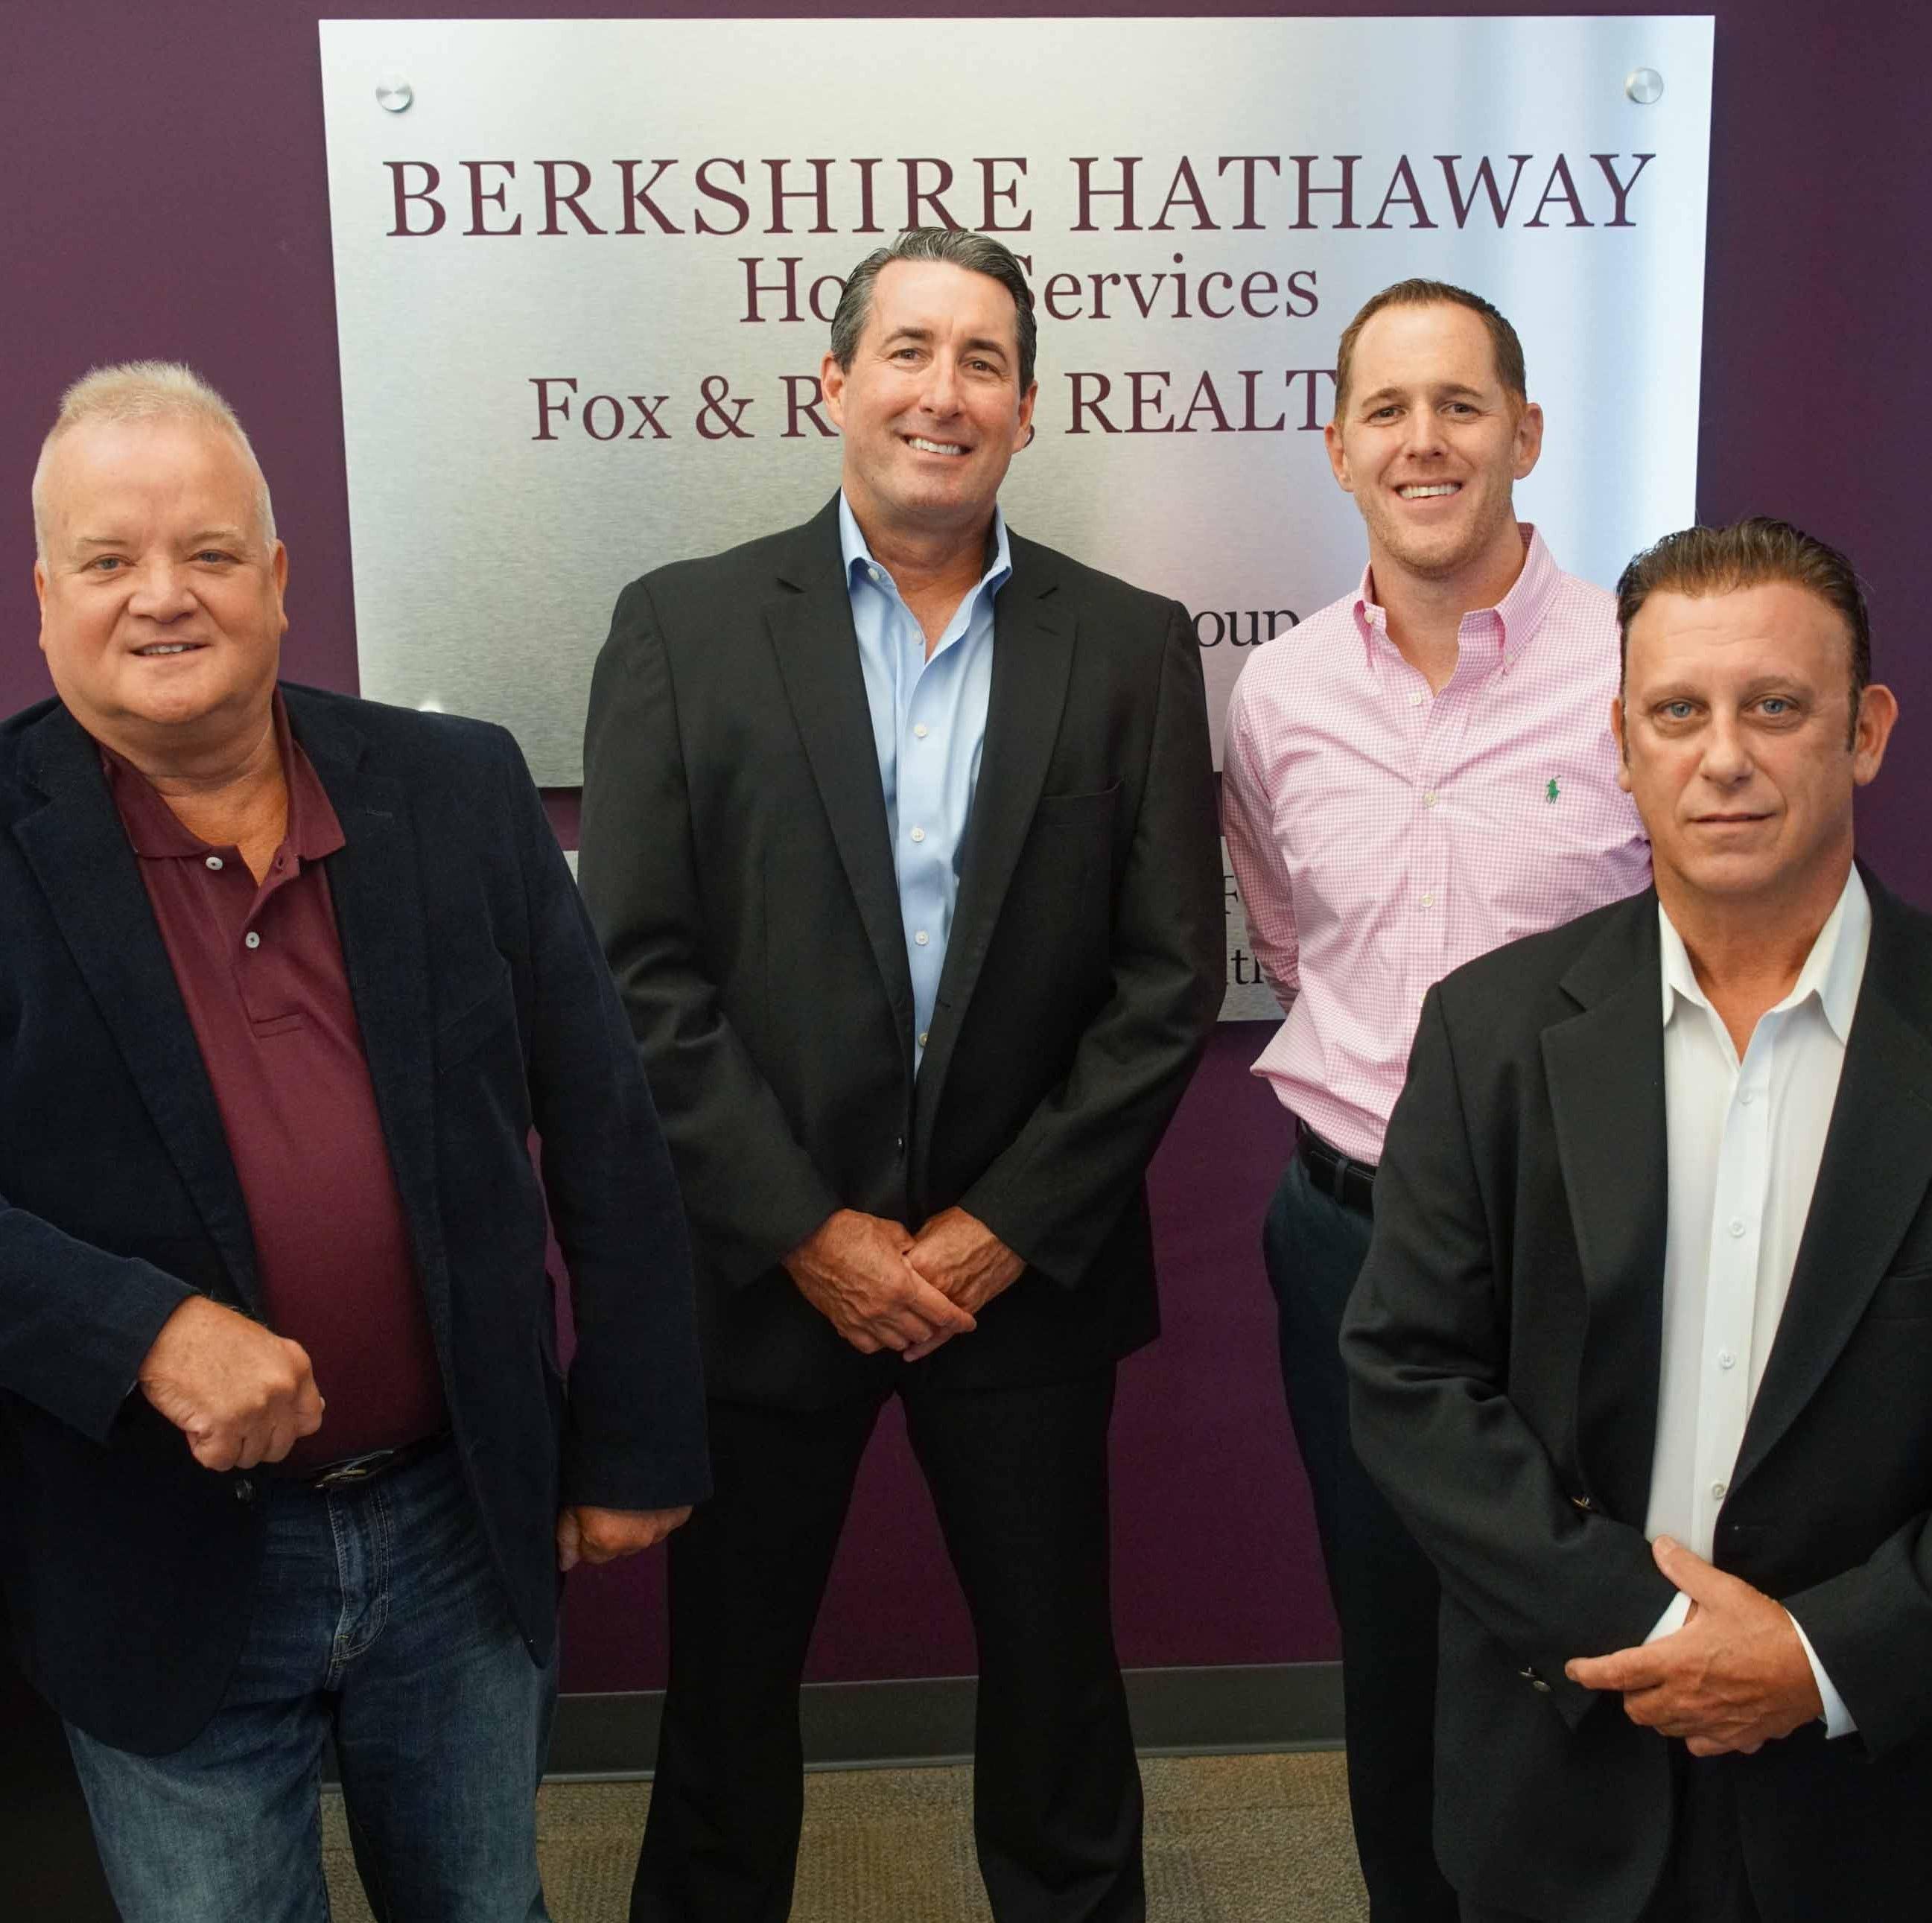 Employees say training, resources set Berkshire Hathaway apart